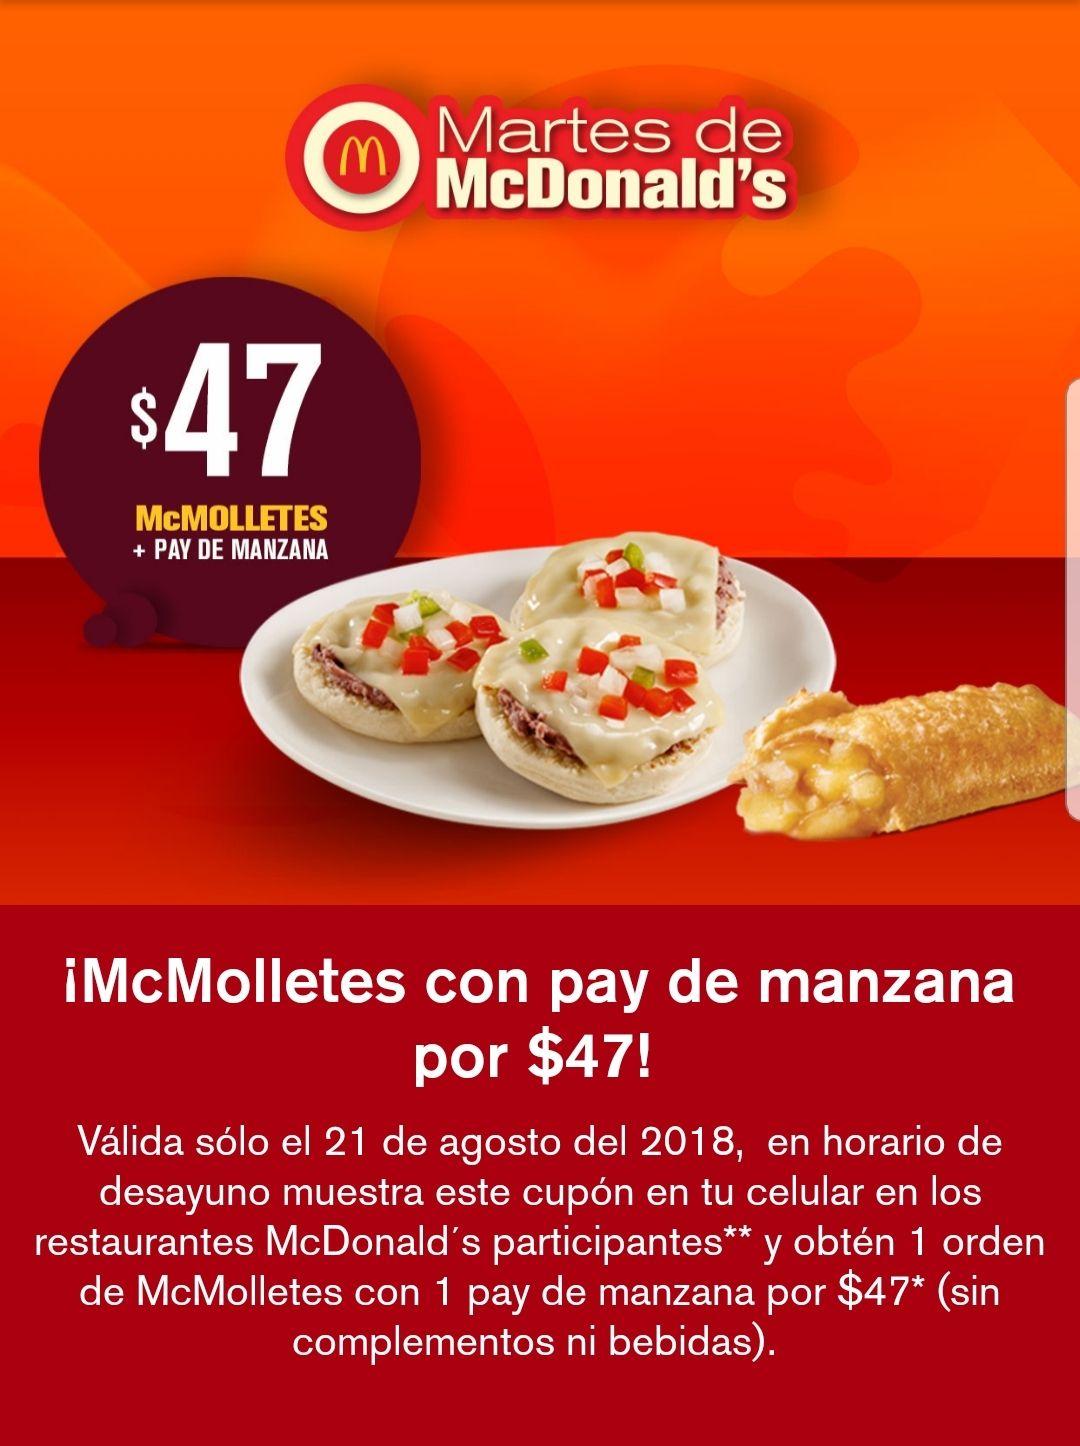 McDonald's: McMolletes con pay de manzana